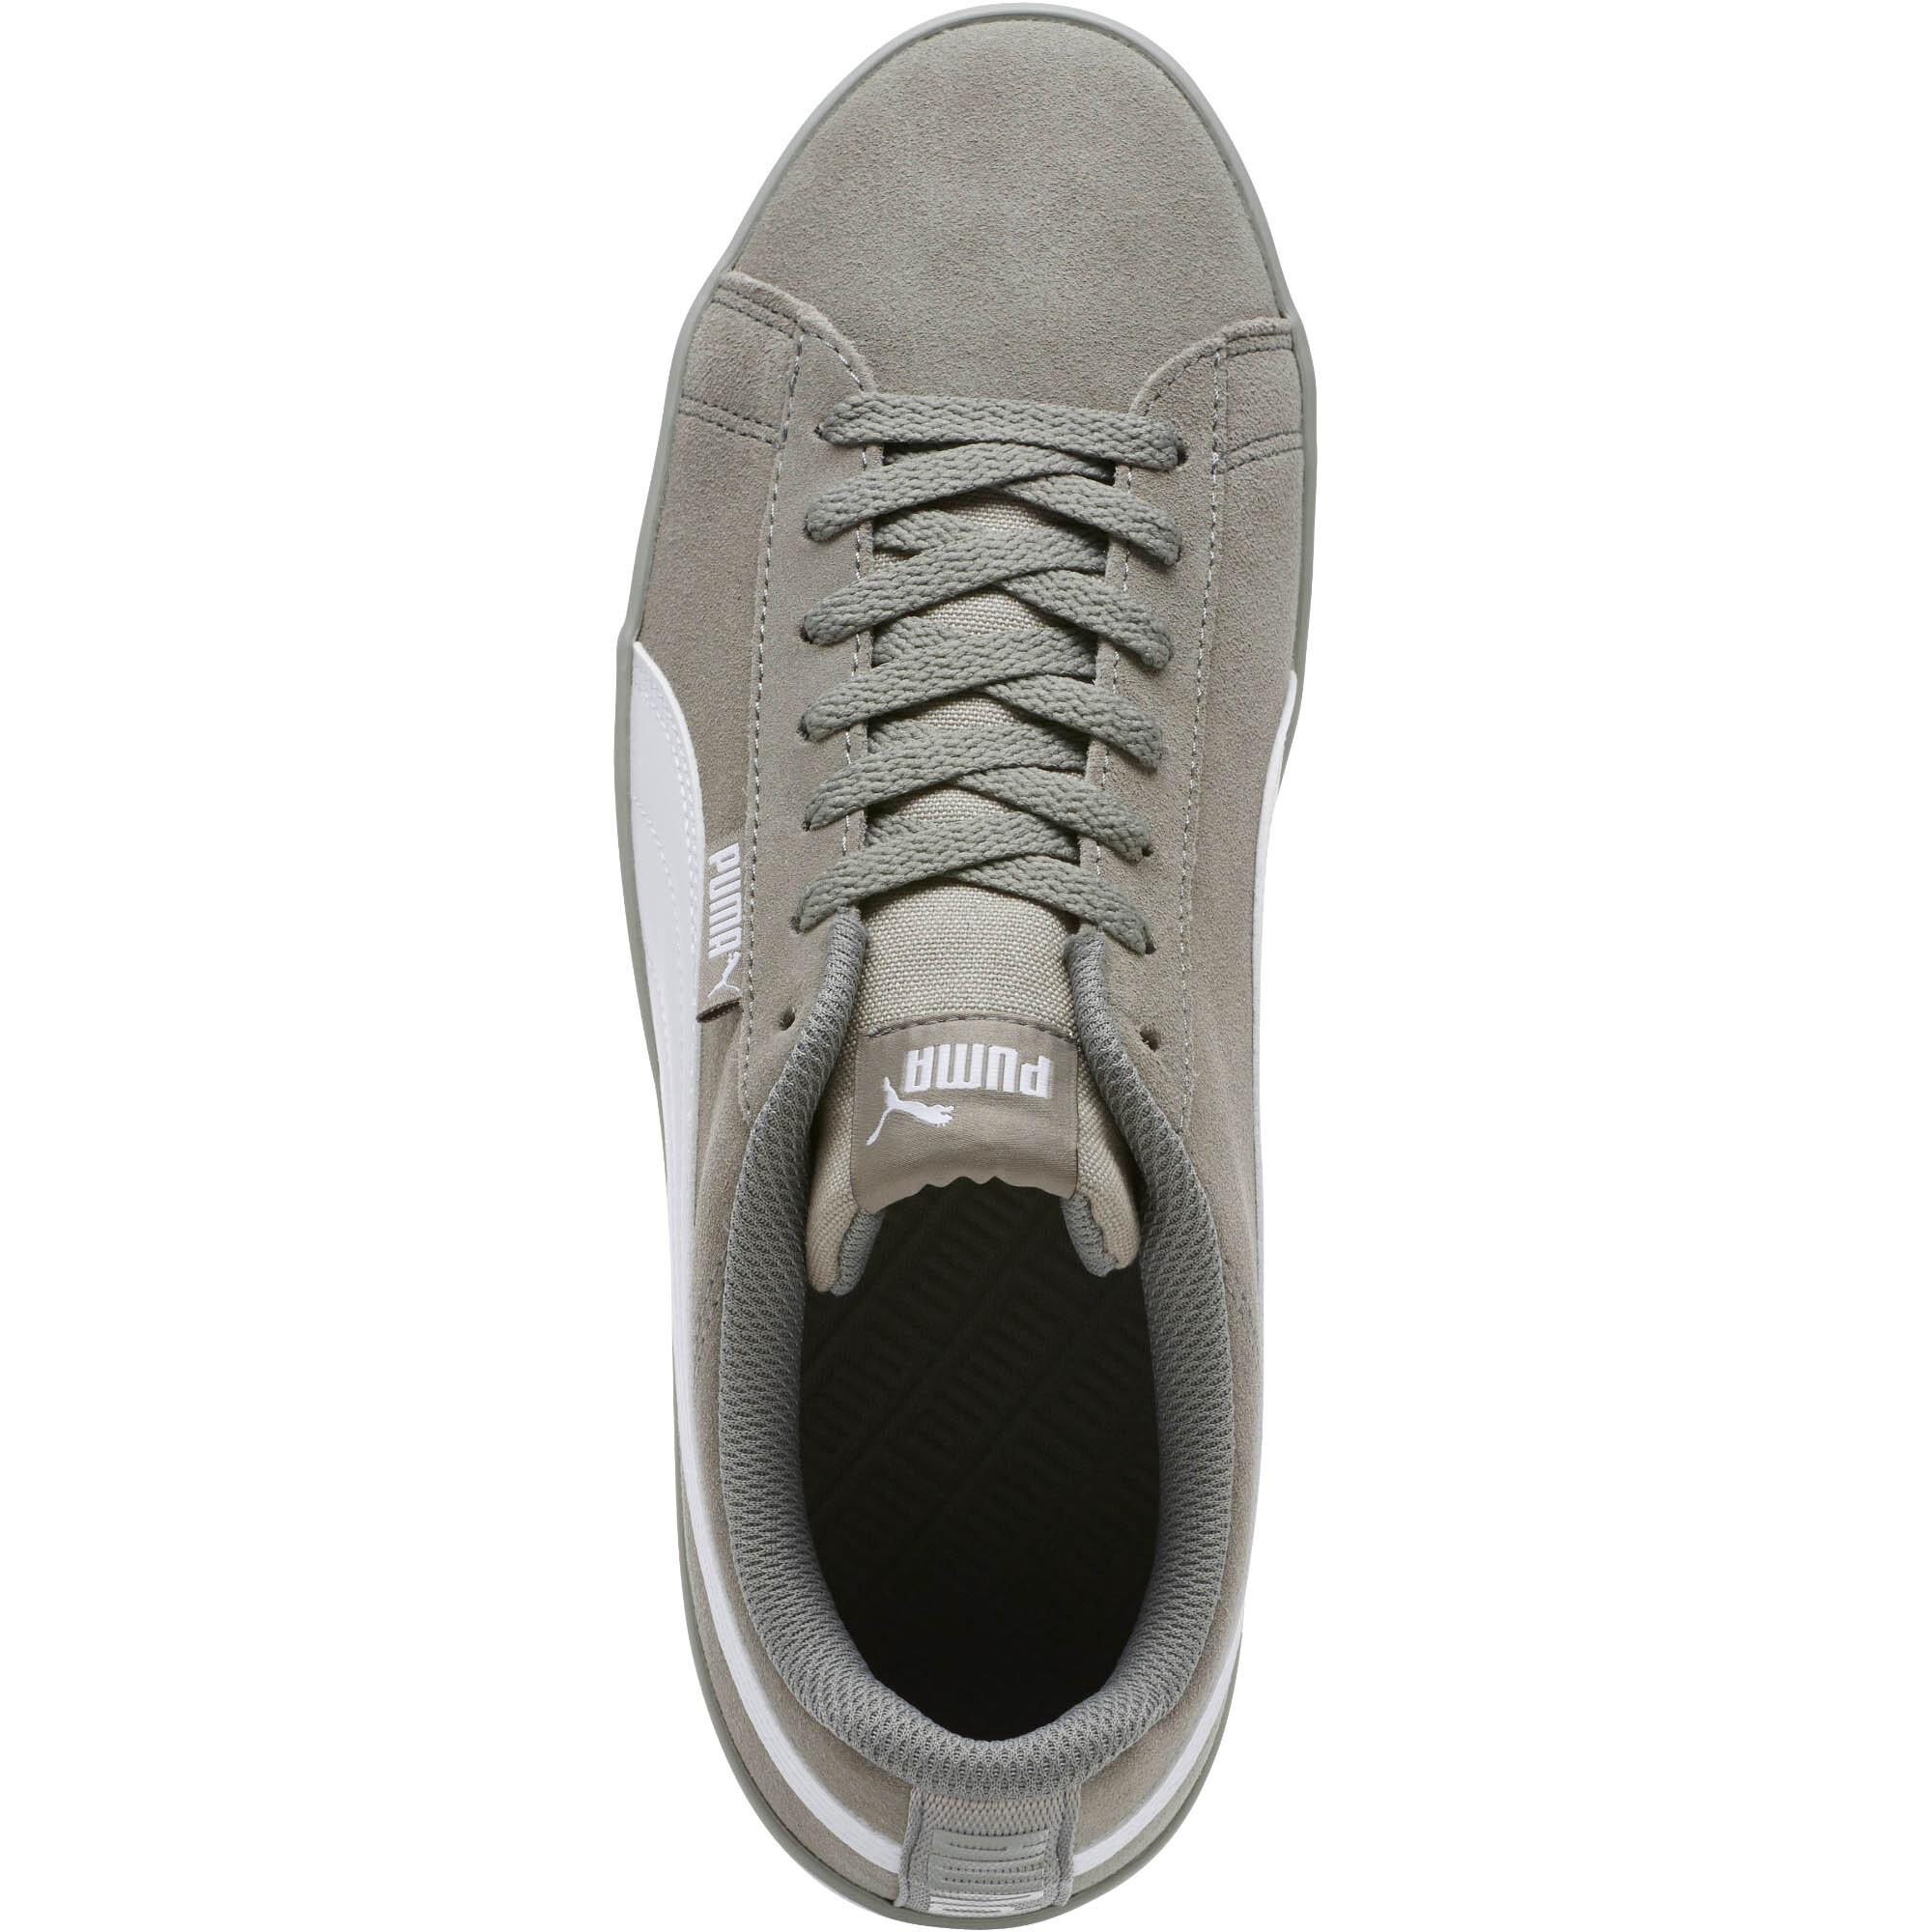 PUMA-Urban-Plus-Suede-Sneakers-Men-Shoe-Basics thumbnail 15